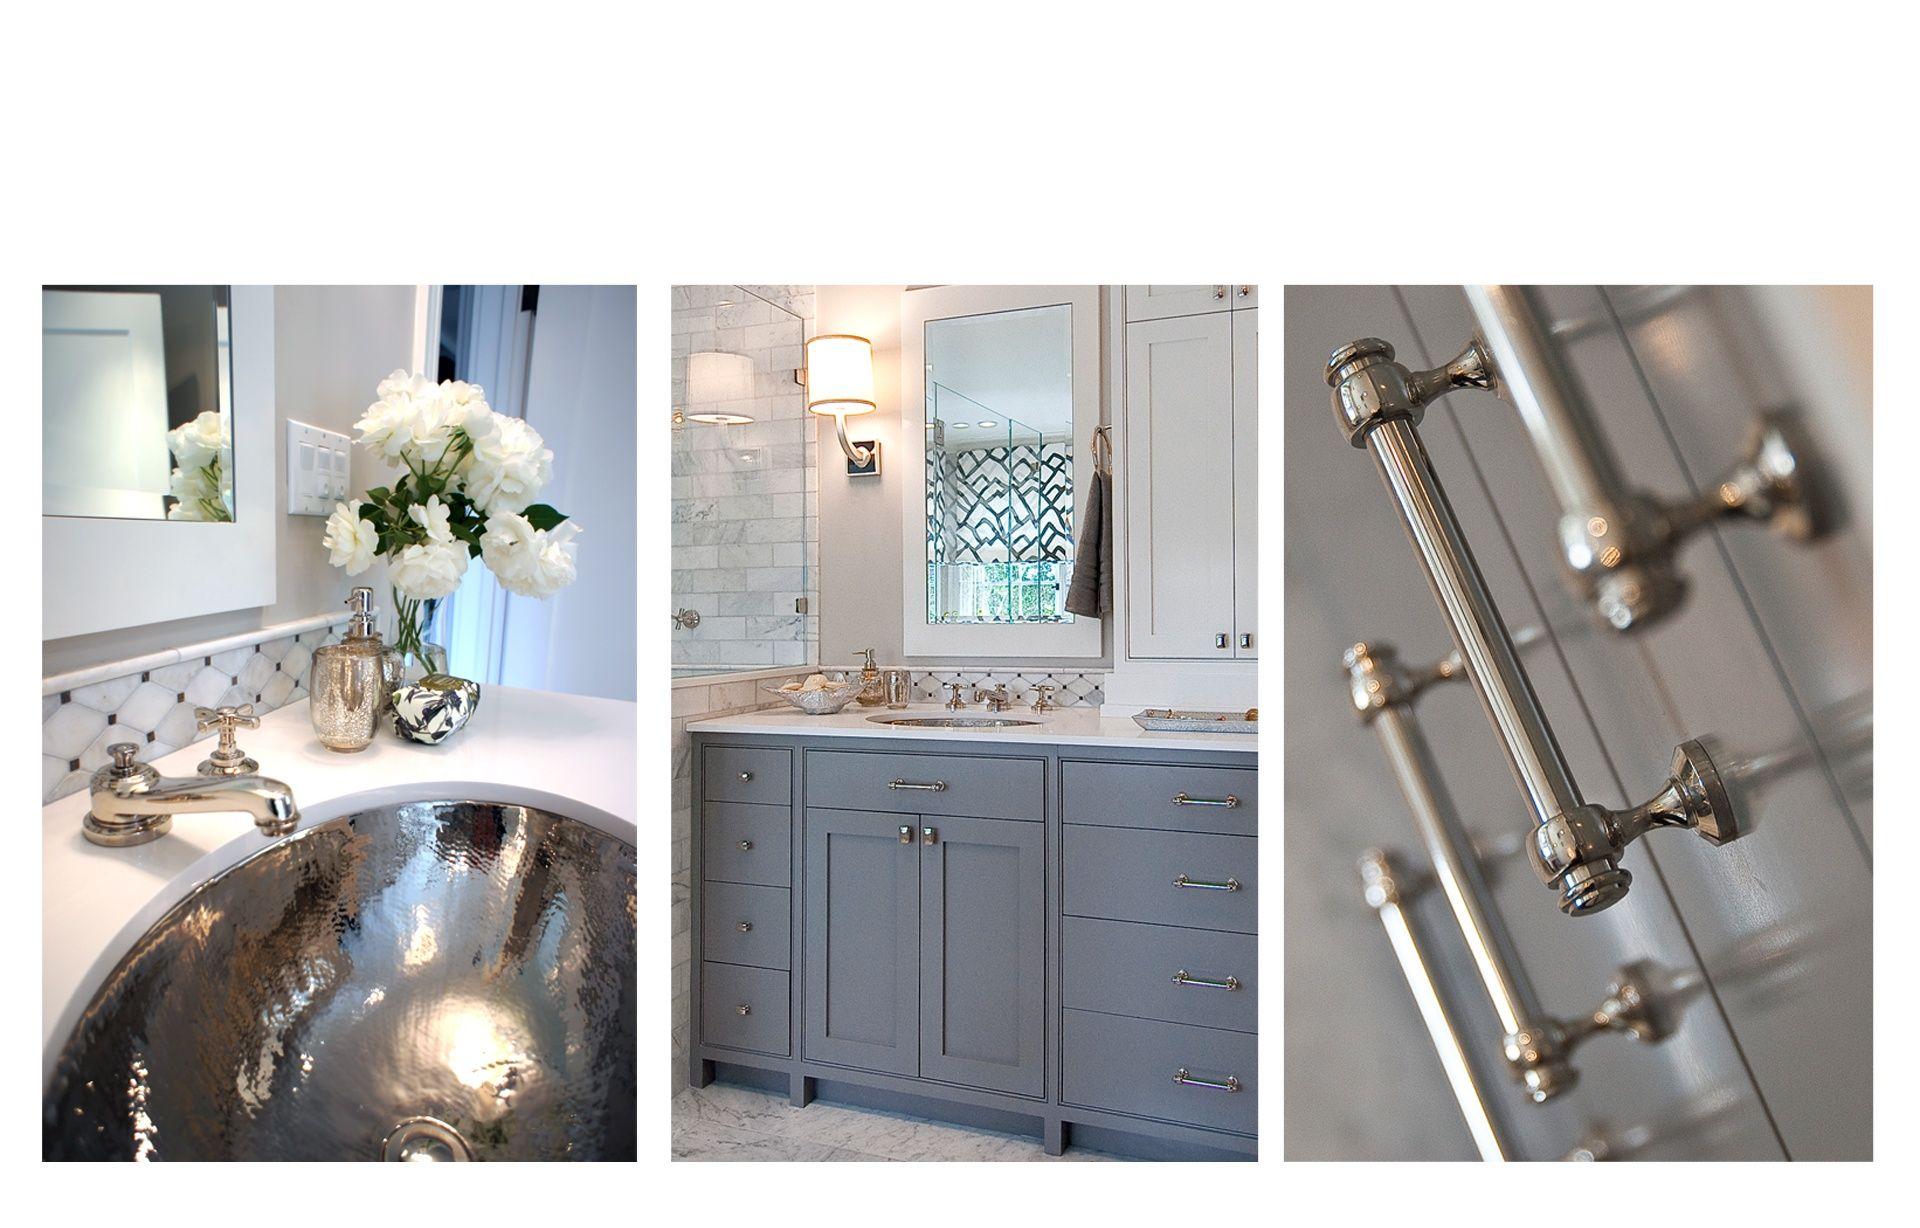 Brewer   Tamara Mack Design - Interior Design & Staging - San Francisco, Bay Area